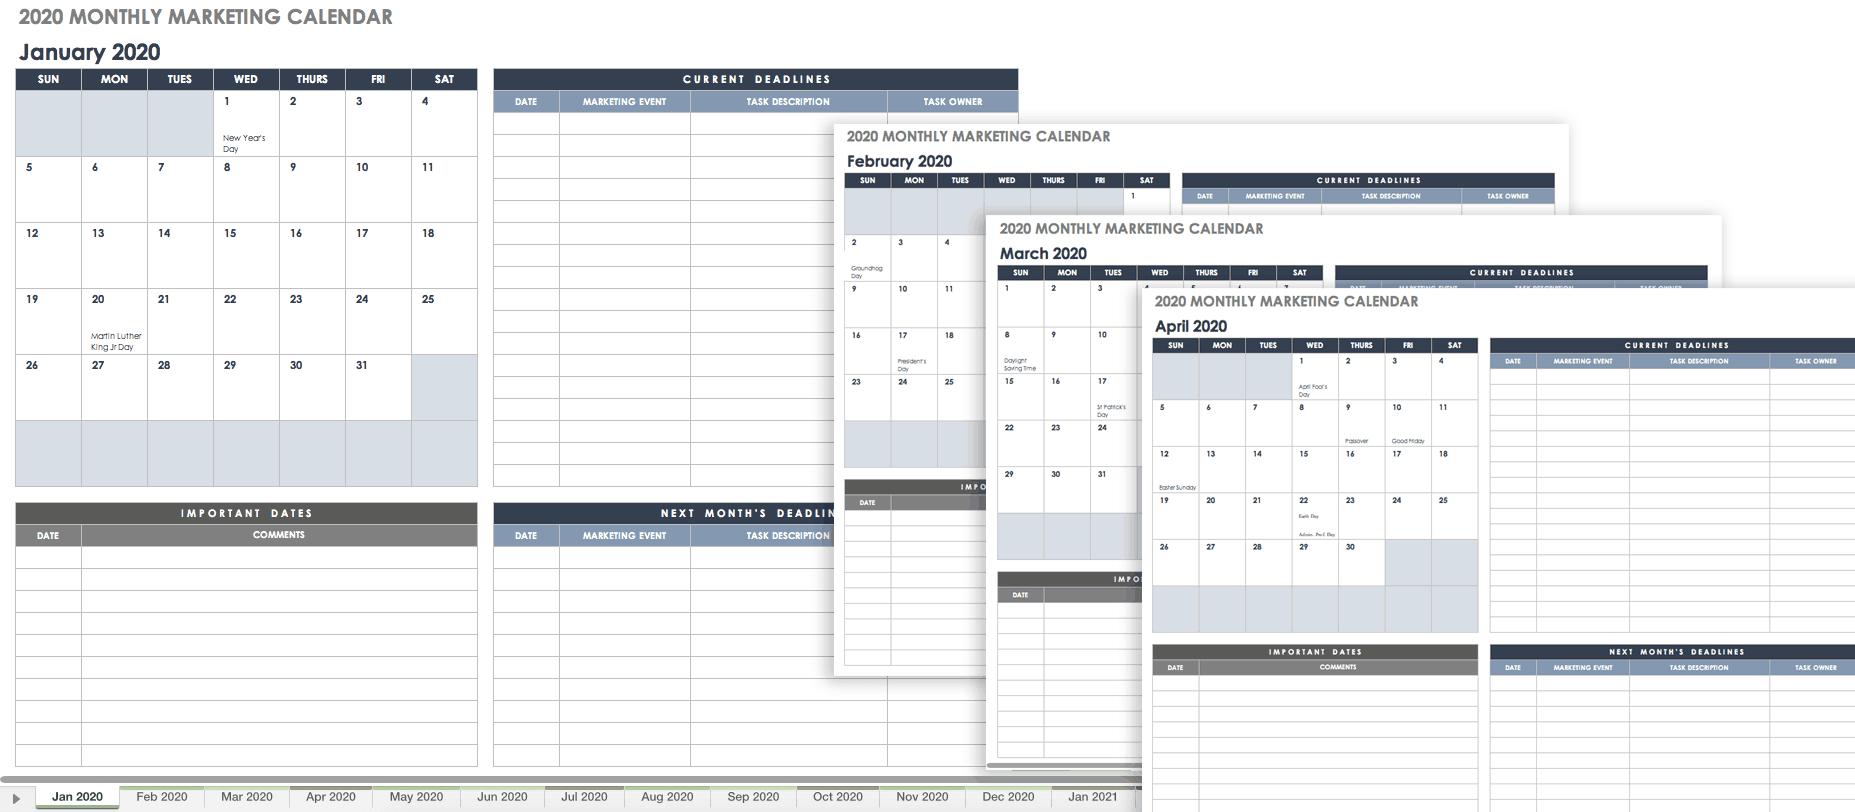 017 Template Ideas Free Excel Templates Calendar Creator Ic with regard to Calendar Creator Excel